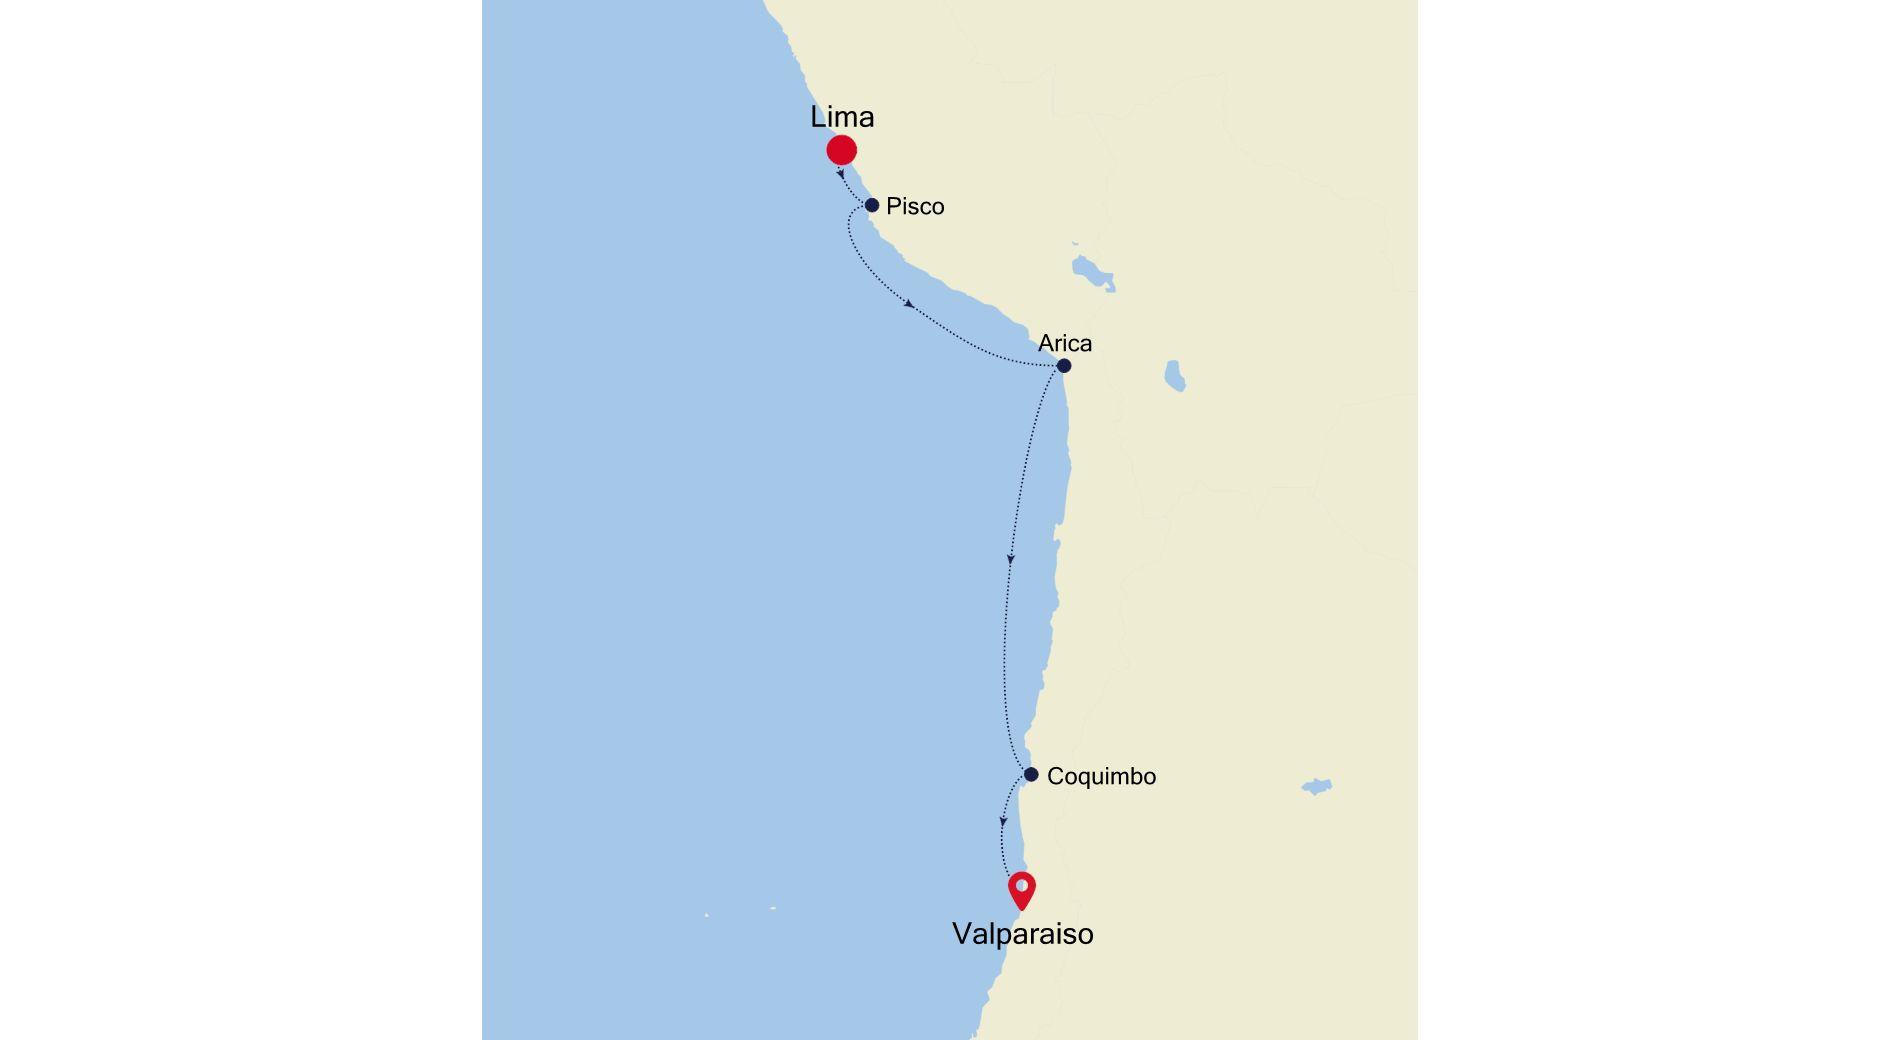 MO210123S08 - Lima to Valparaiso